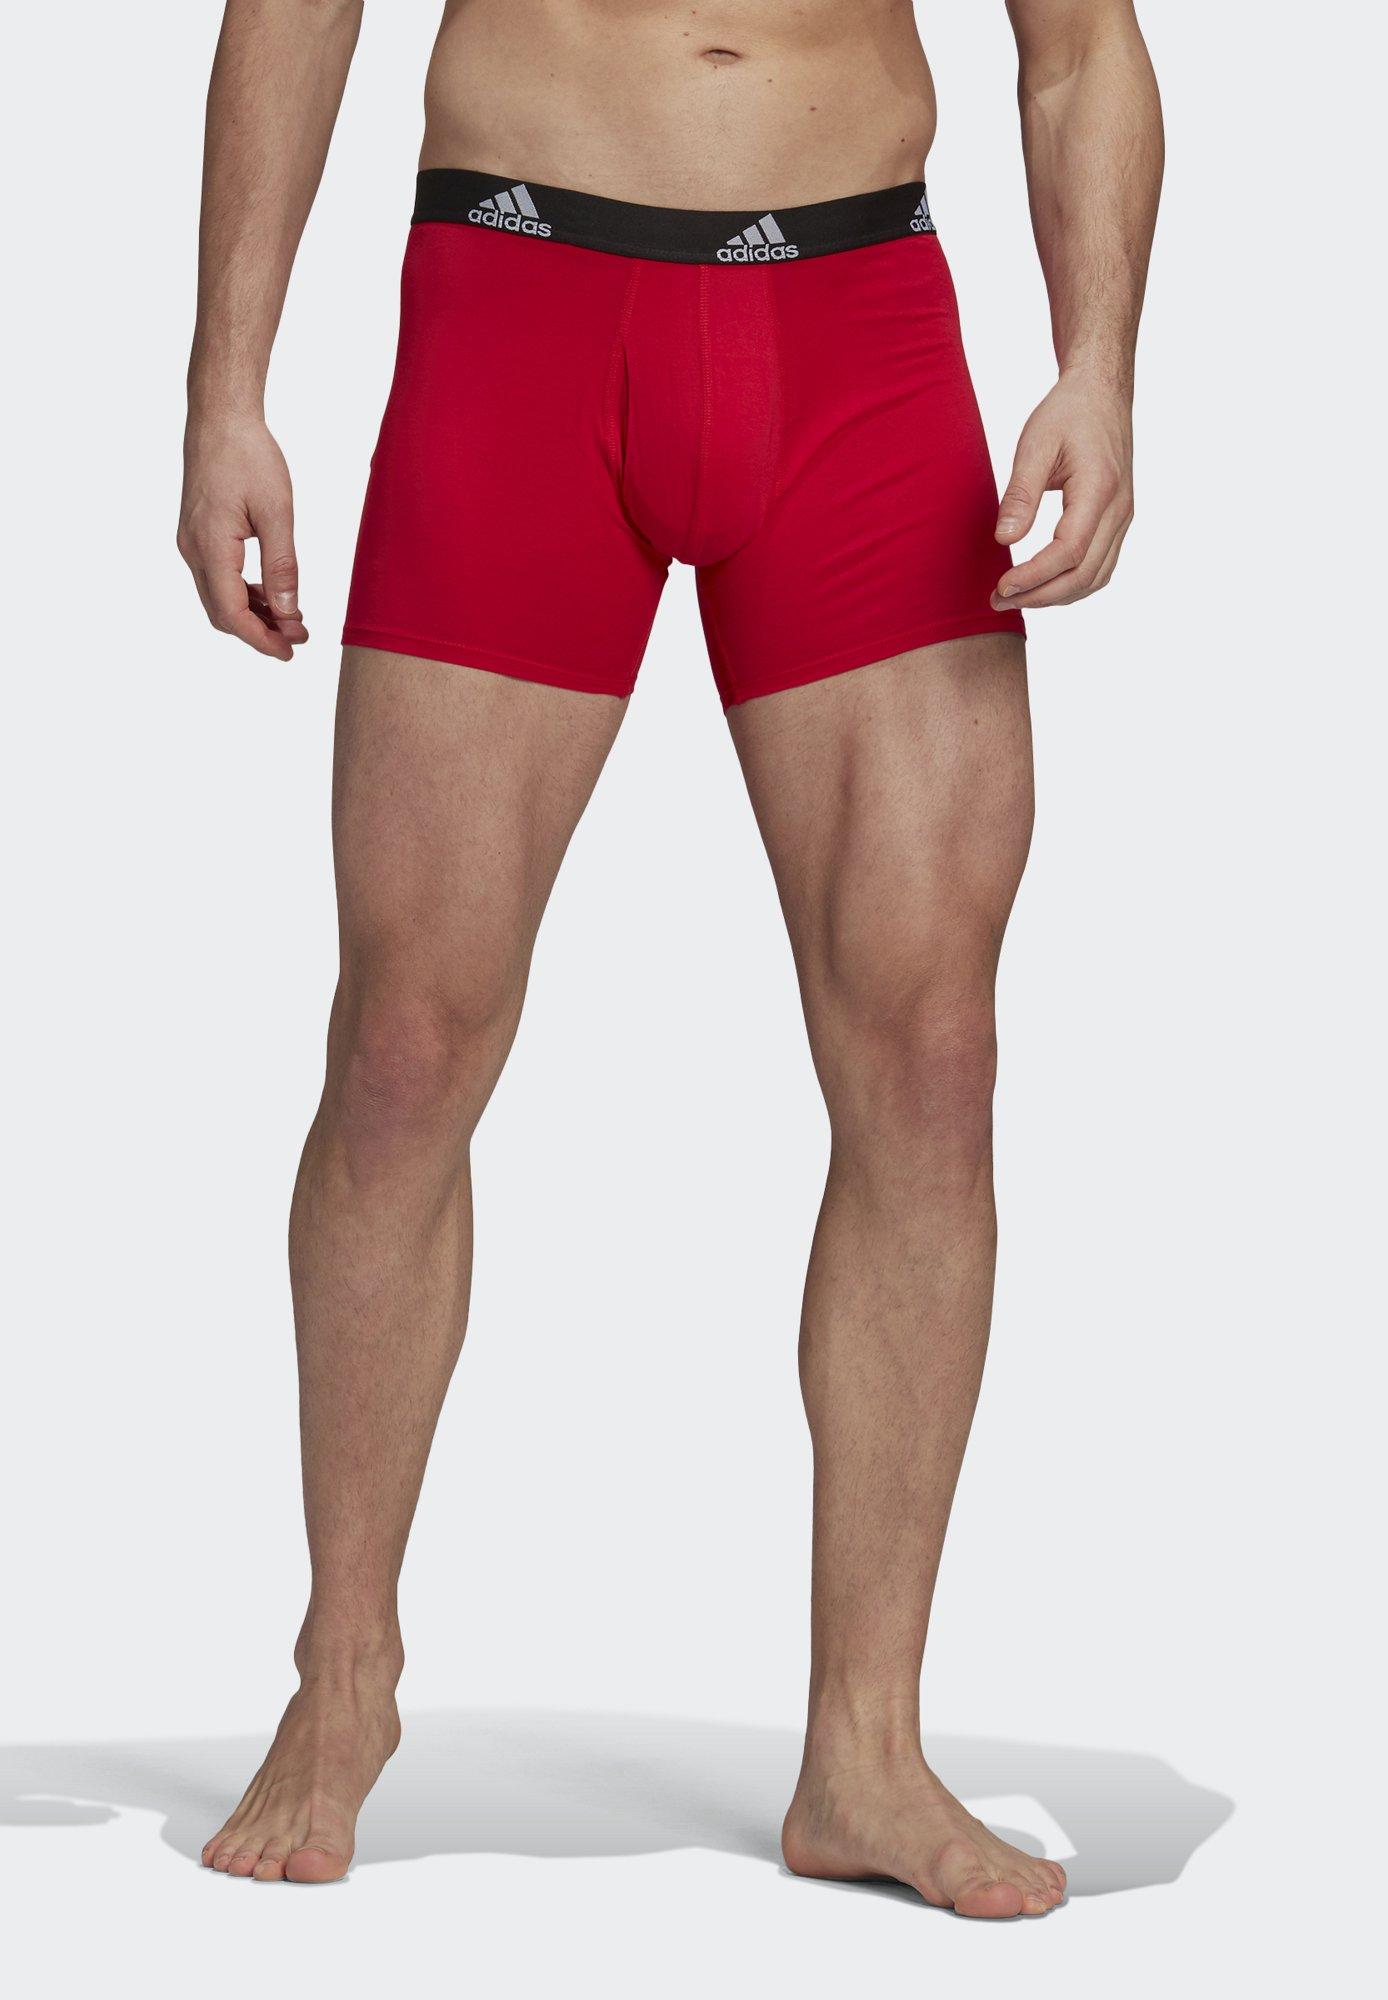 Men BADGE OF SPORT BRIEF 3 PACK ESSENTIALS - Pants